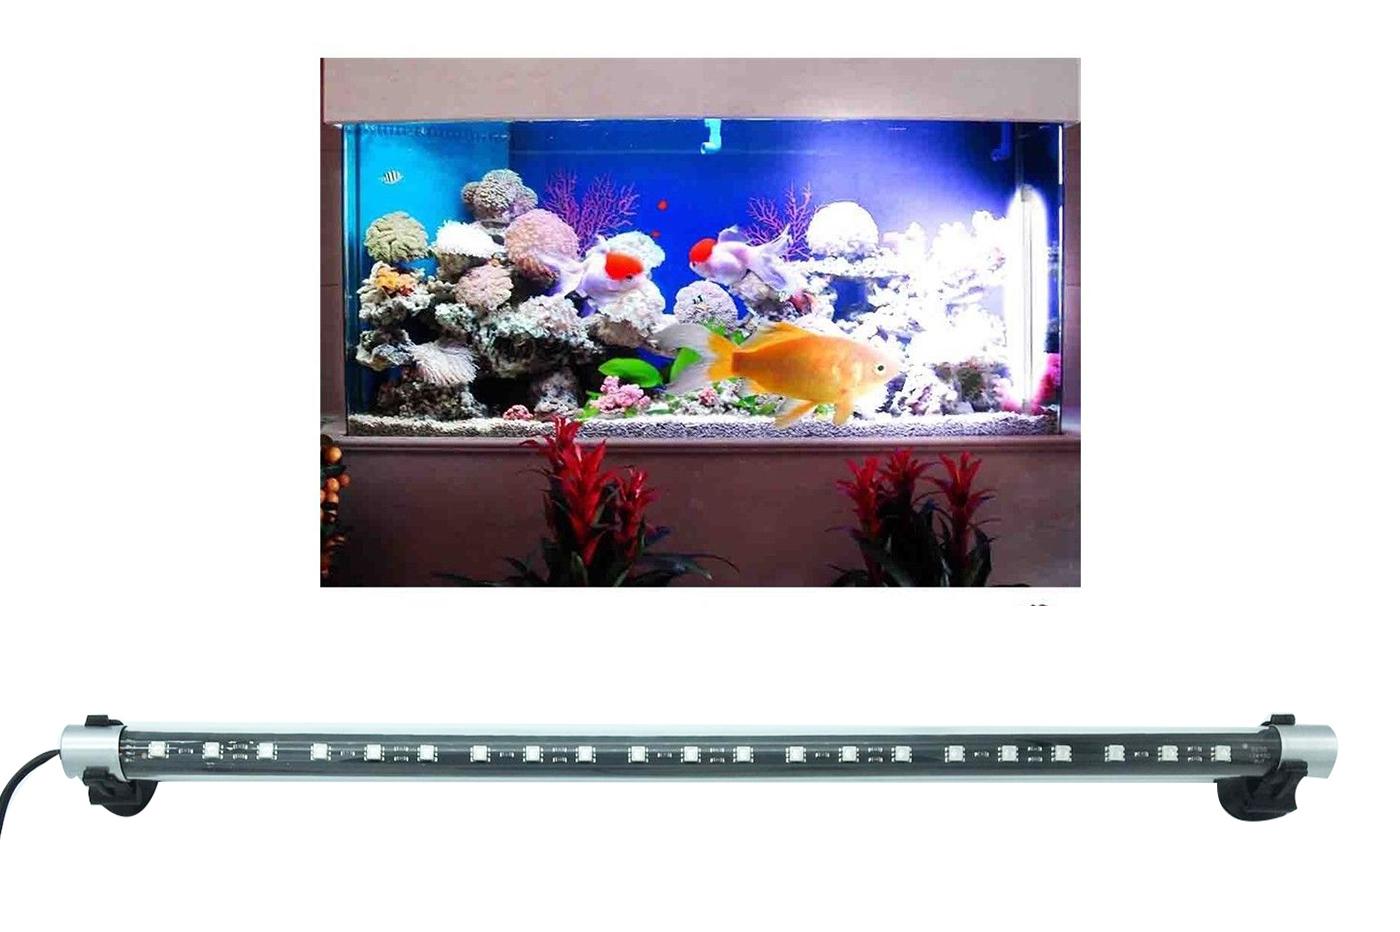 Luce Led Acquario.Dettagli Su Lampada Led Immersione Per Acquario Pesci Tubo Led Luce Rgb T4 3w